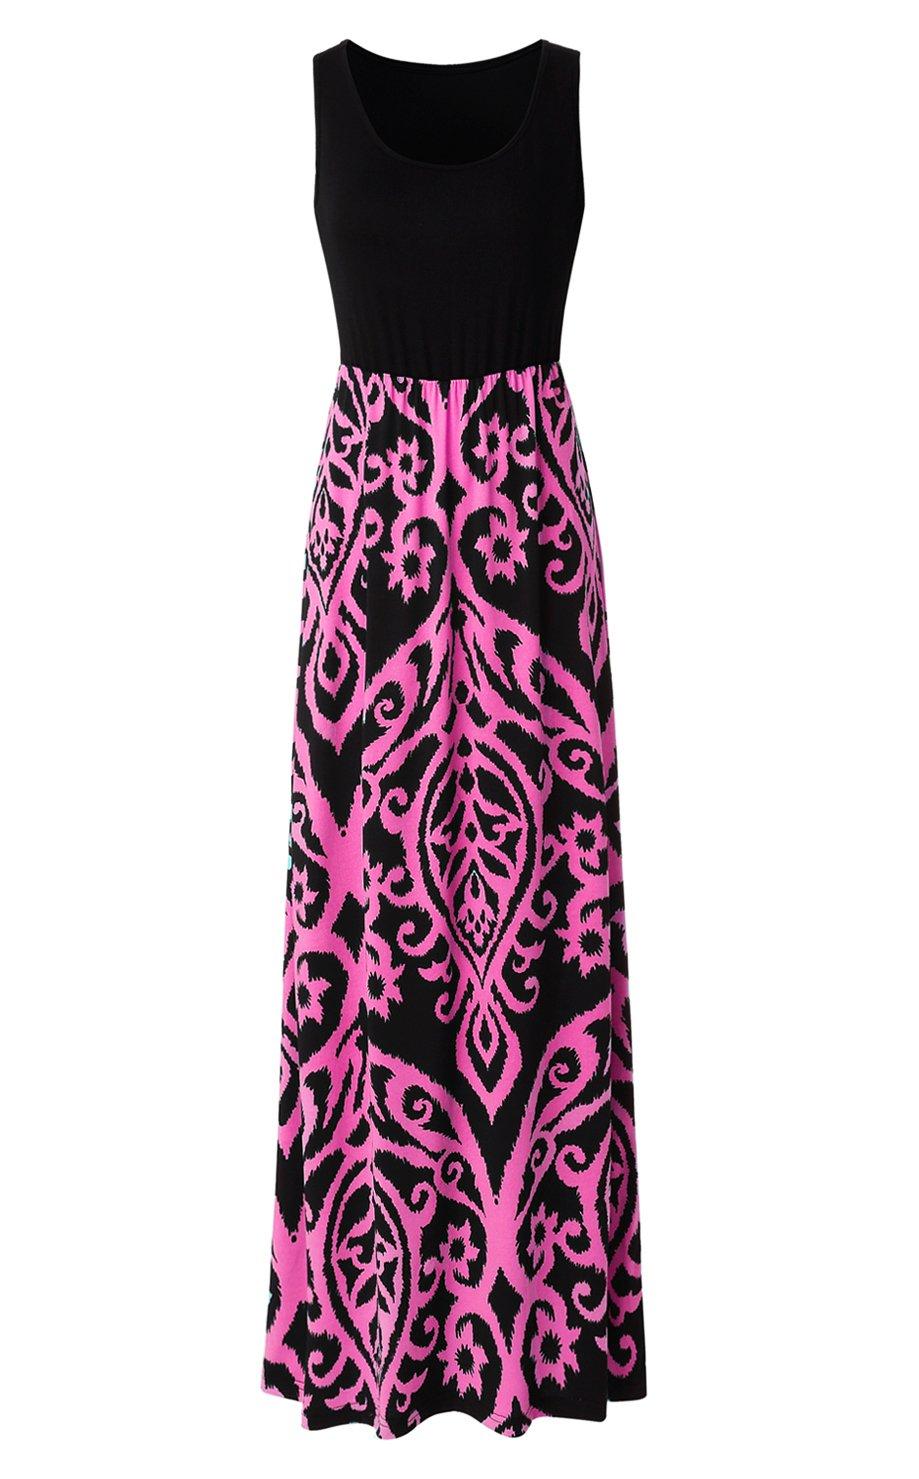 69a2bb4f1bb Galleon - Zattcas Womens Summer Contrast Sleeveless Tank Top Floral Print  Maxi Dress